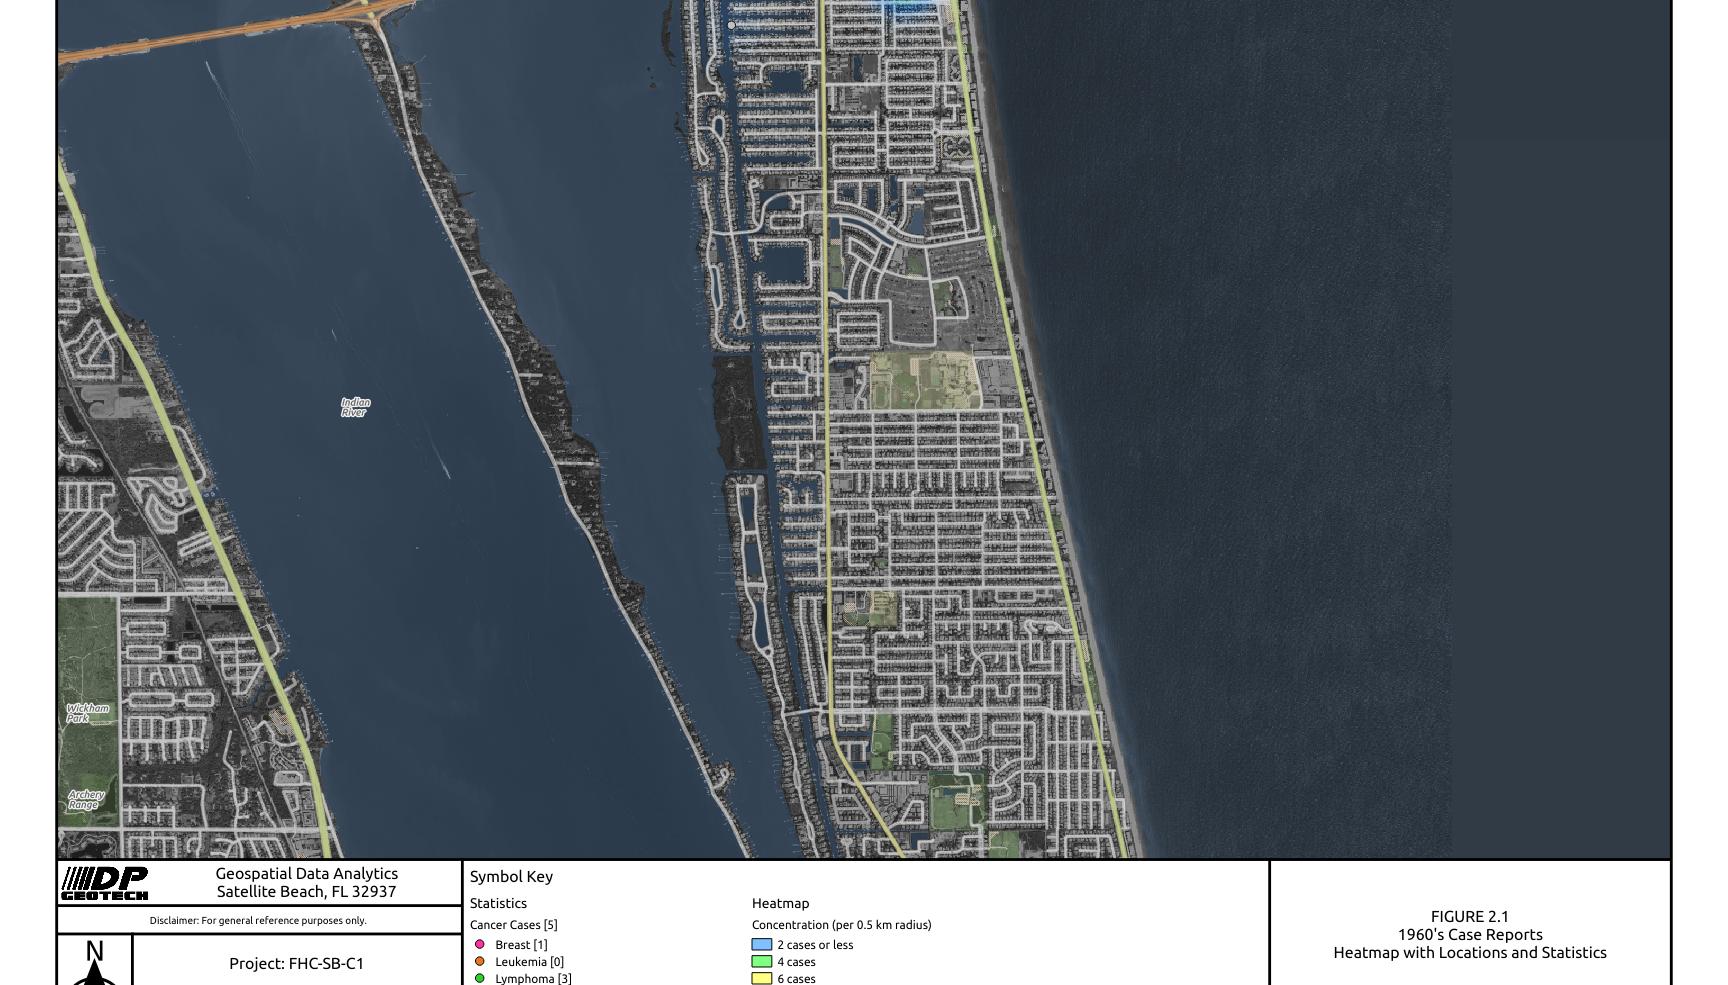 1960 Satellite Beach Cancer Cases Heat Map